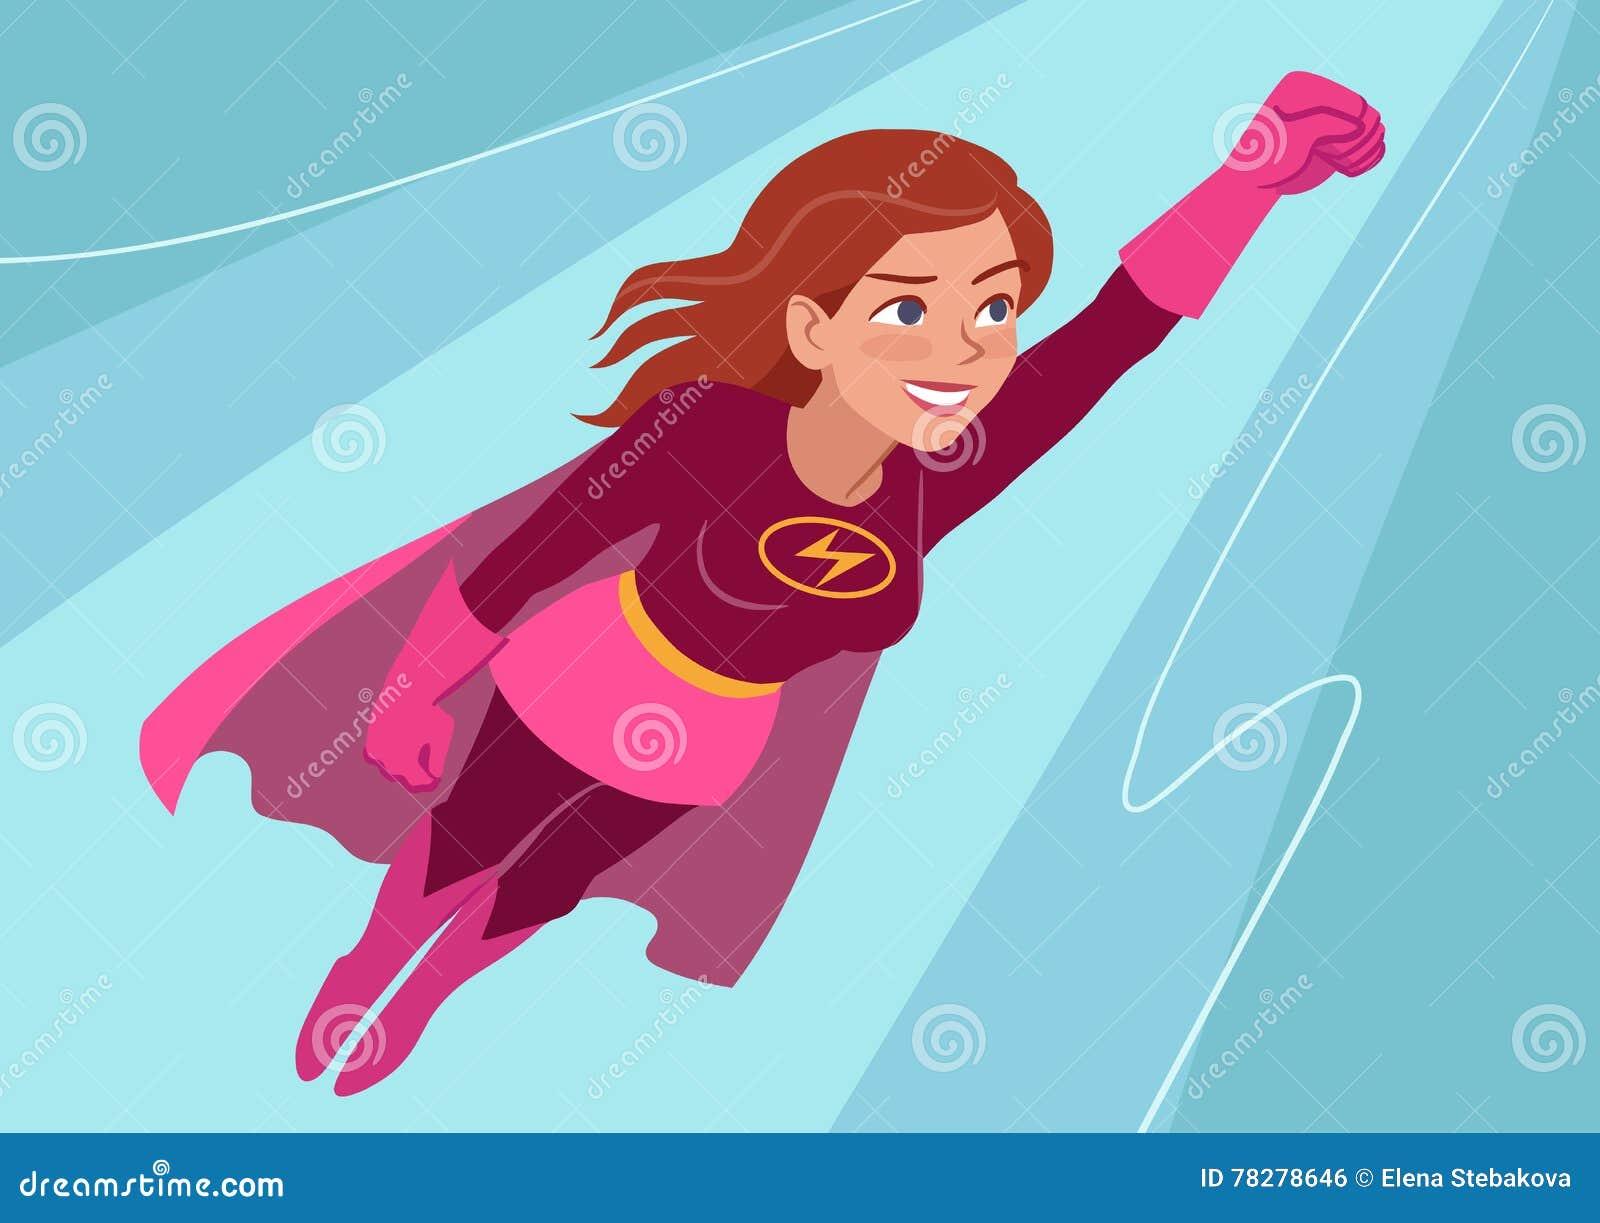 superhero cartoon characters flying wwwimgkidcom the